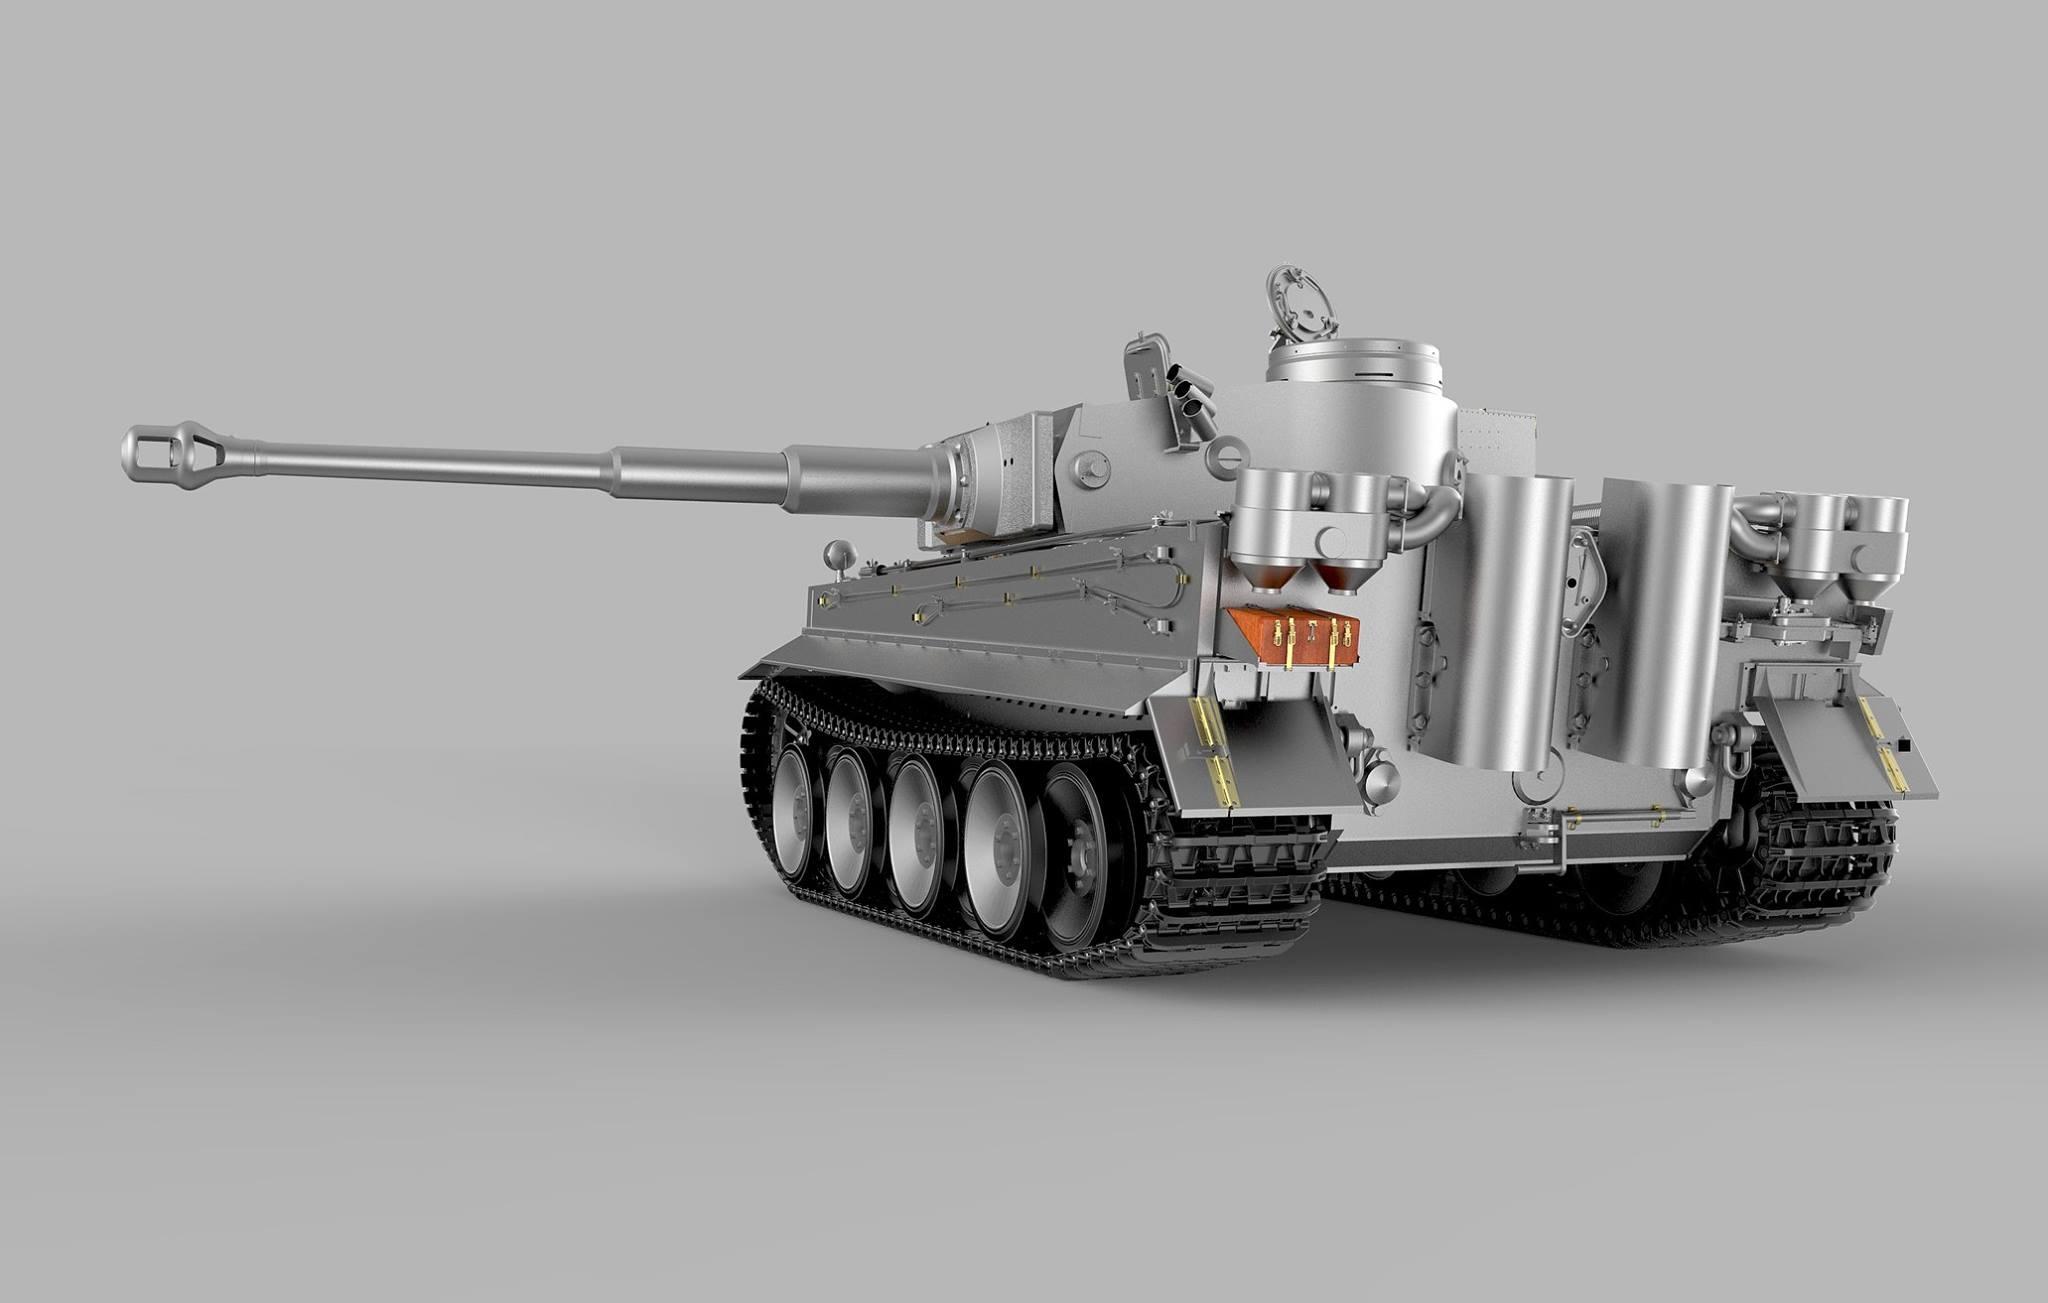 картинки танка тигр со всех сторон панно